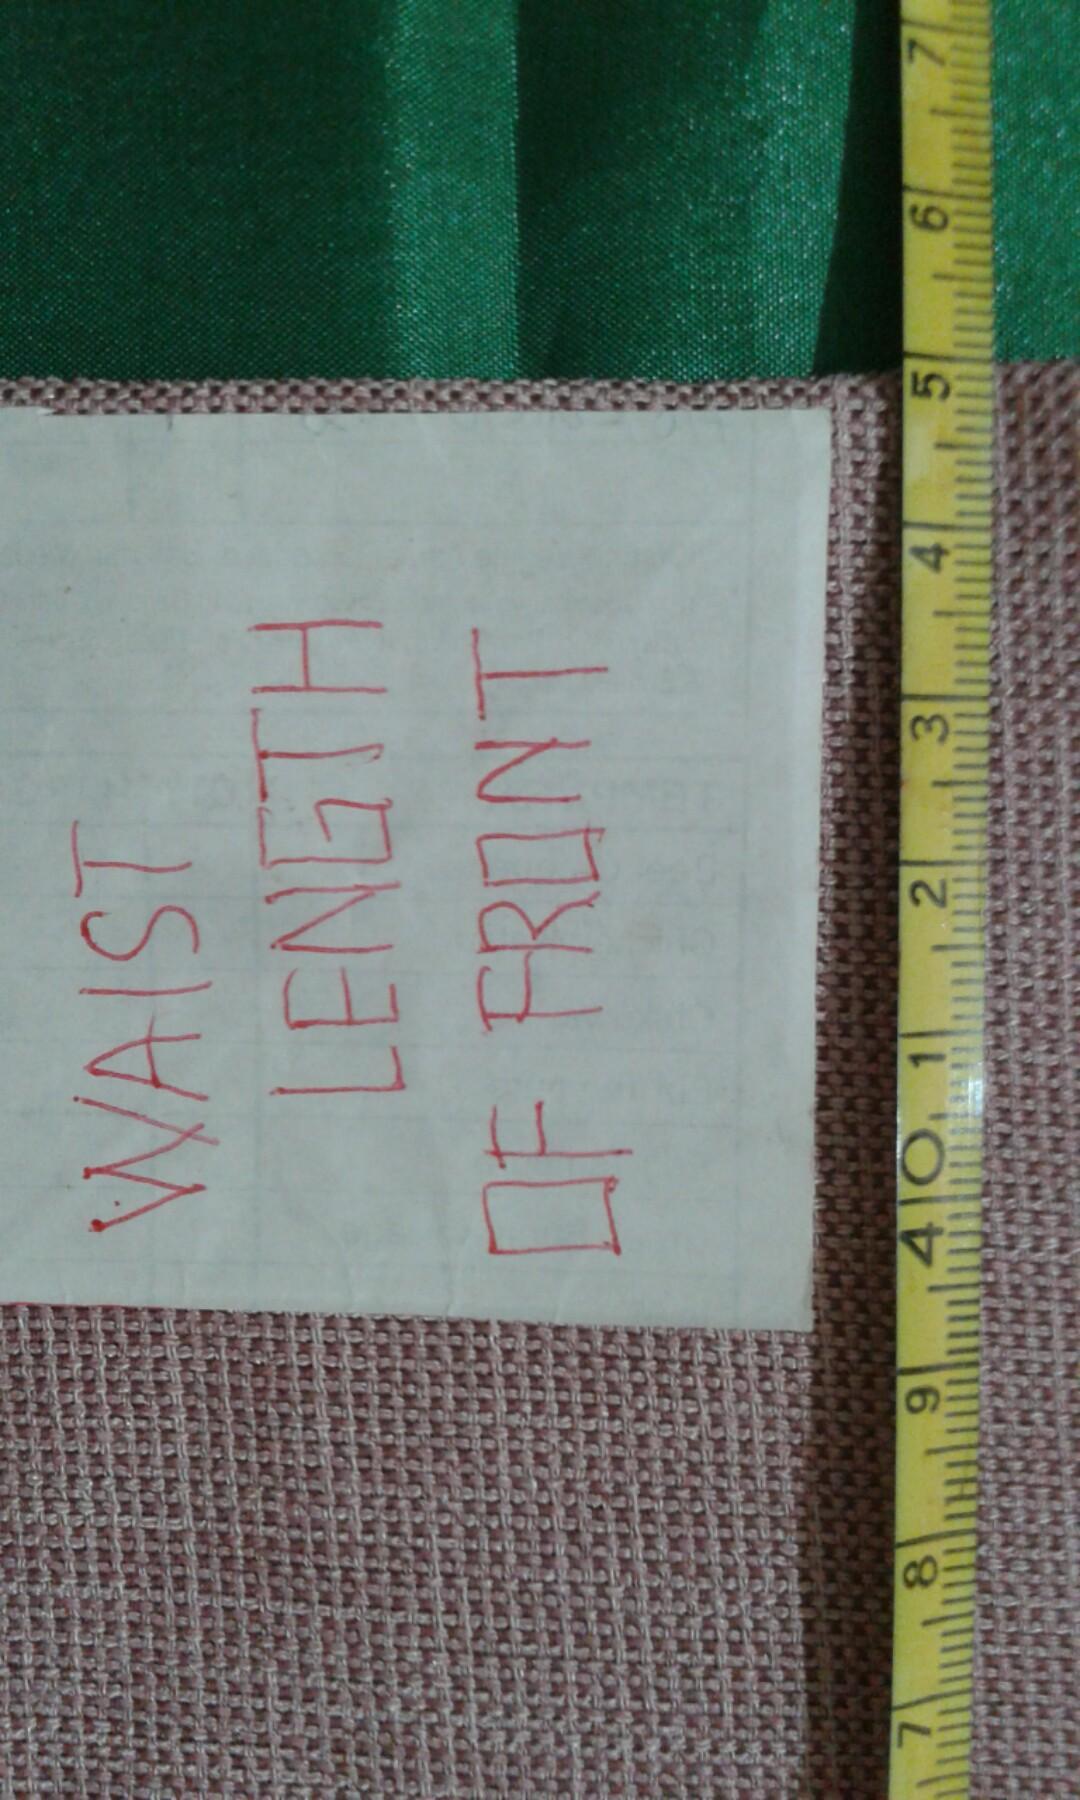 B) Waistcoat to wear a collar woman is pink.